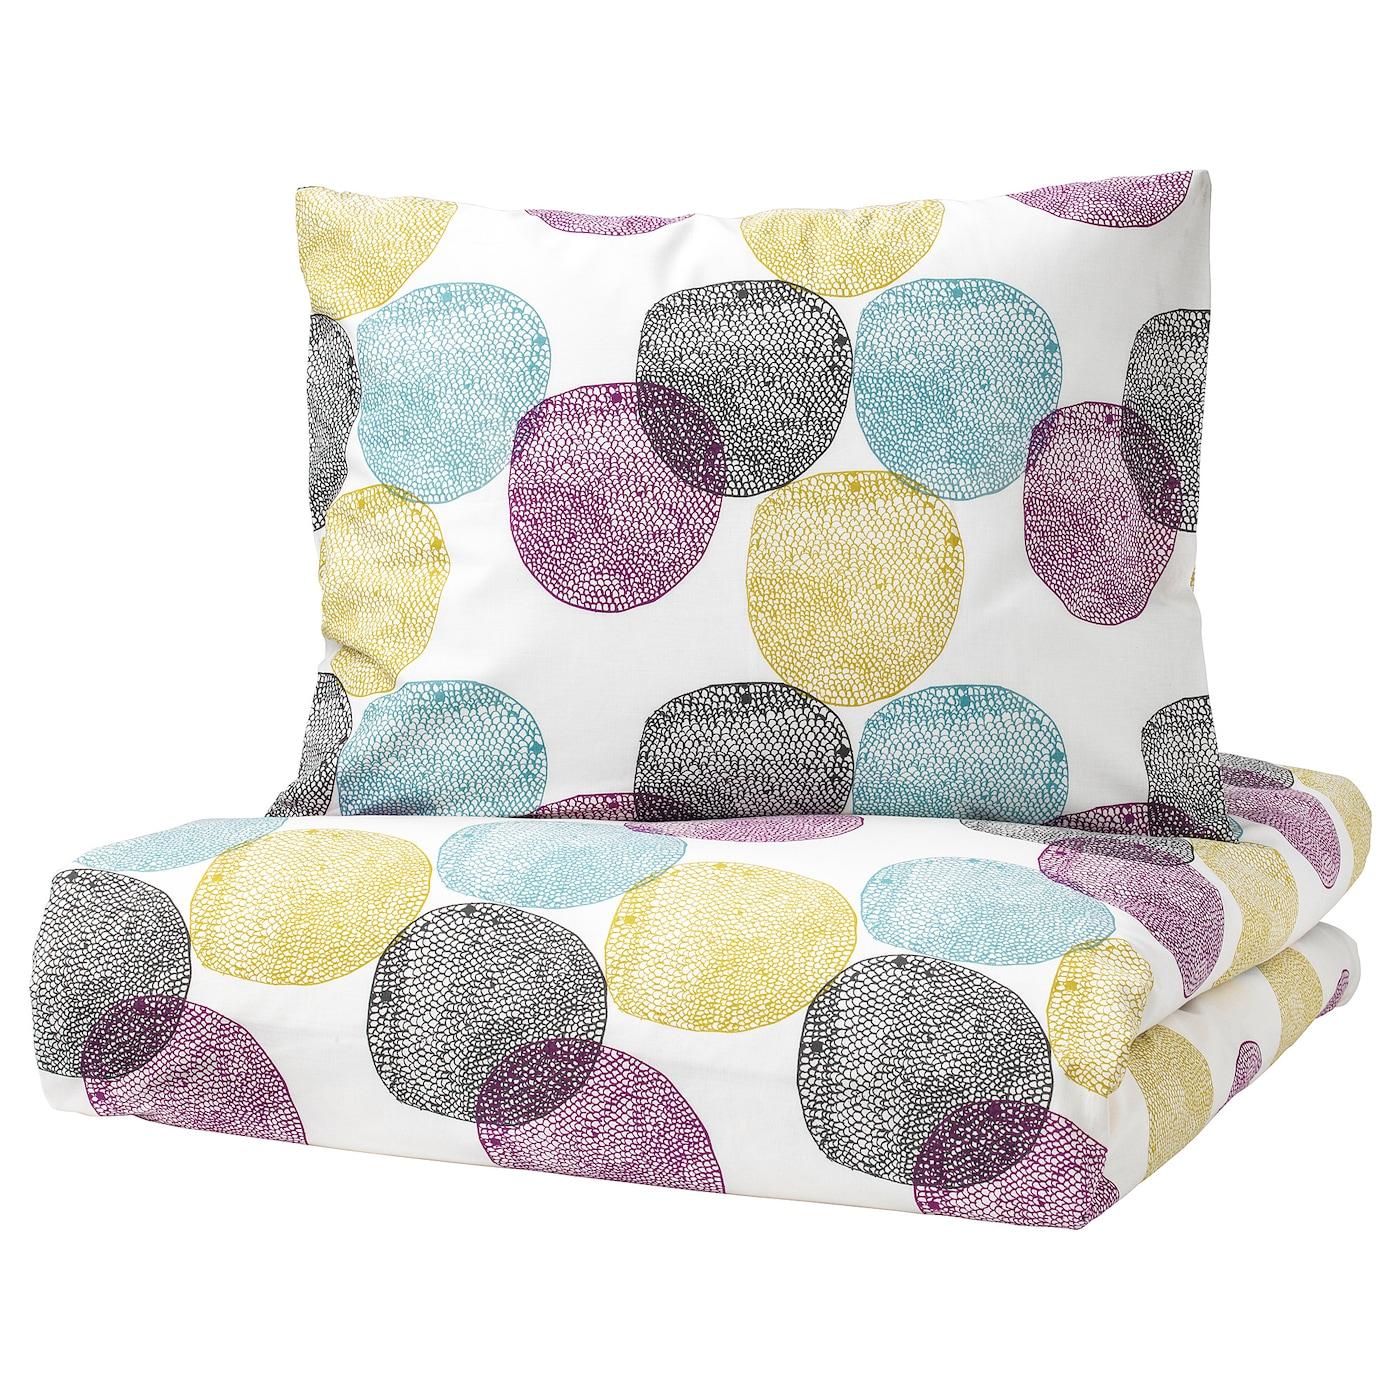 malin rund housse de couette et taie multicolore 150 x 200 50 x 60 cm ikea. Black Bedroom Furniture Sets. Home Design Ideas